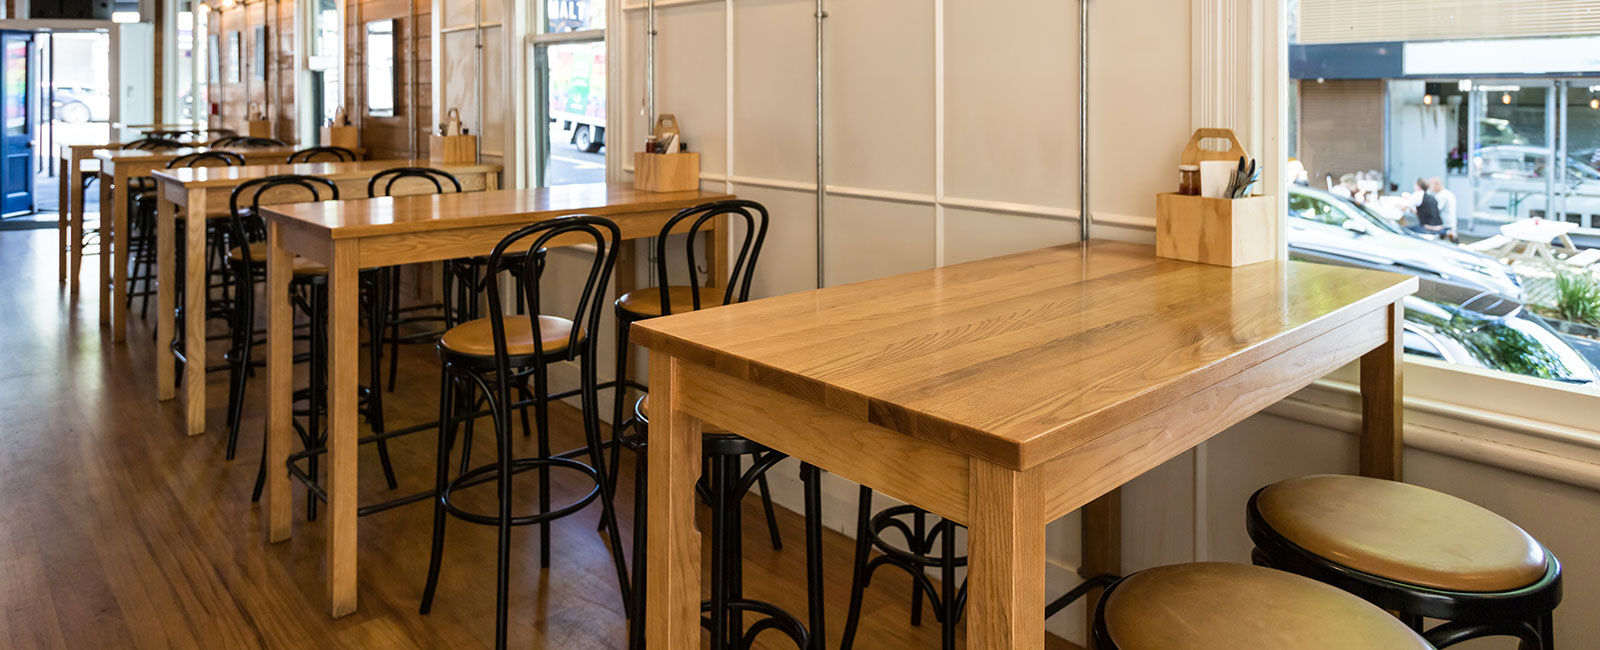 Malt Public House Bar Furniture